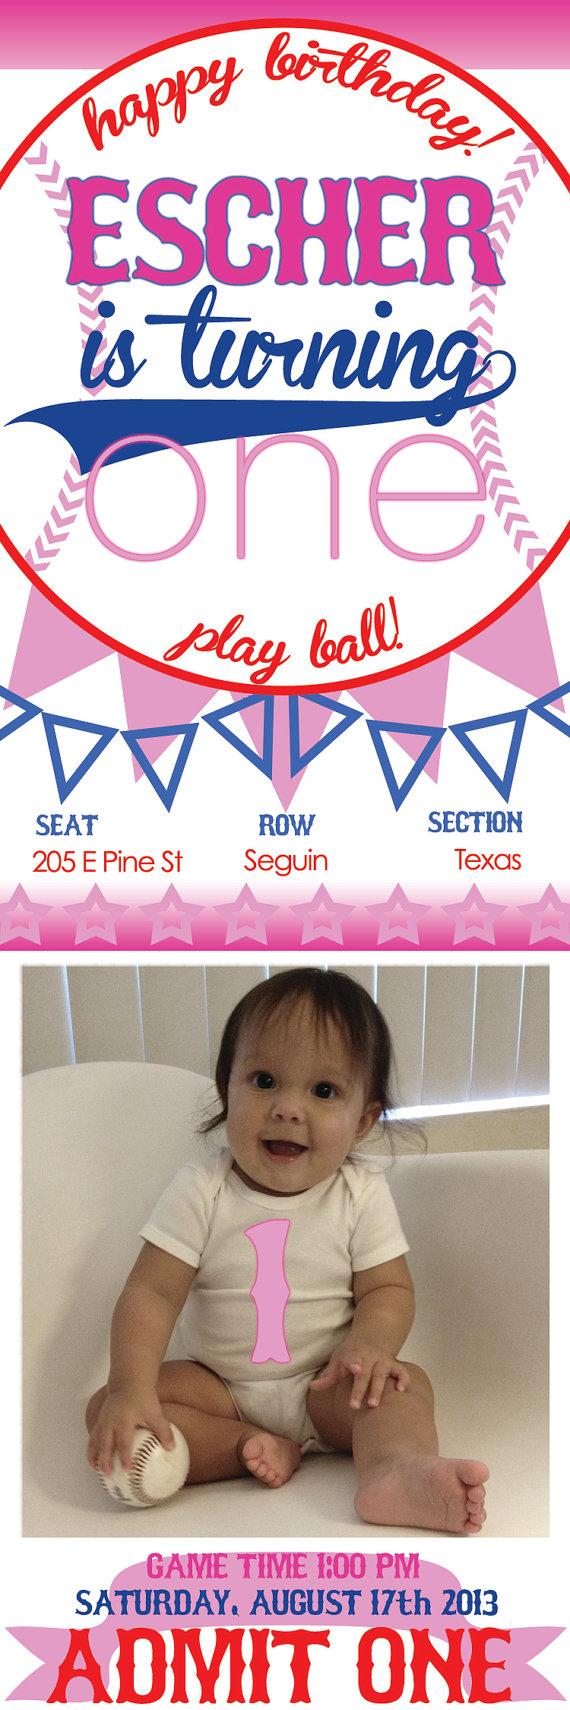 Baby Girl Baseball Birthday Party Ticket Invitation Digital File on Etsy, $15.00